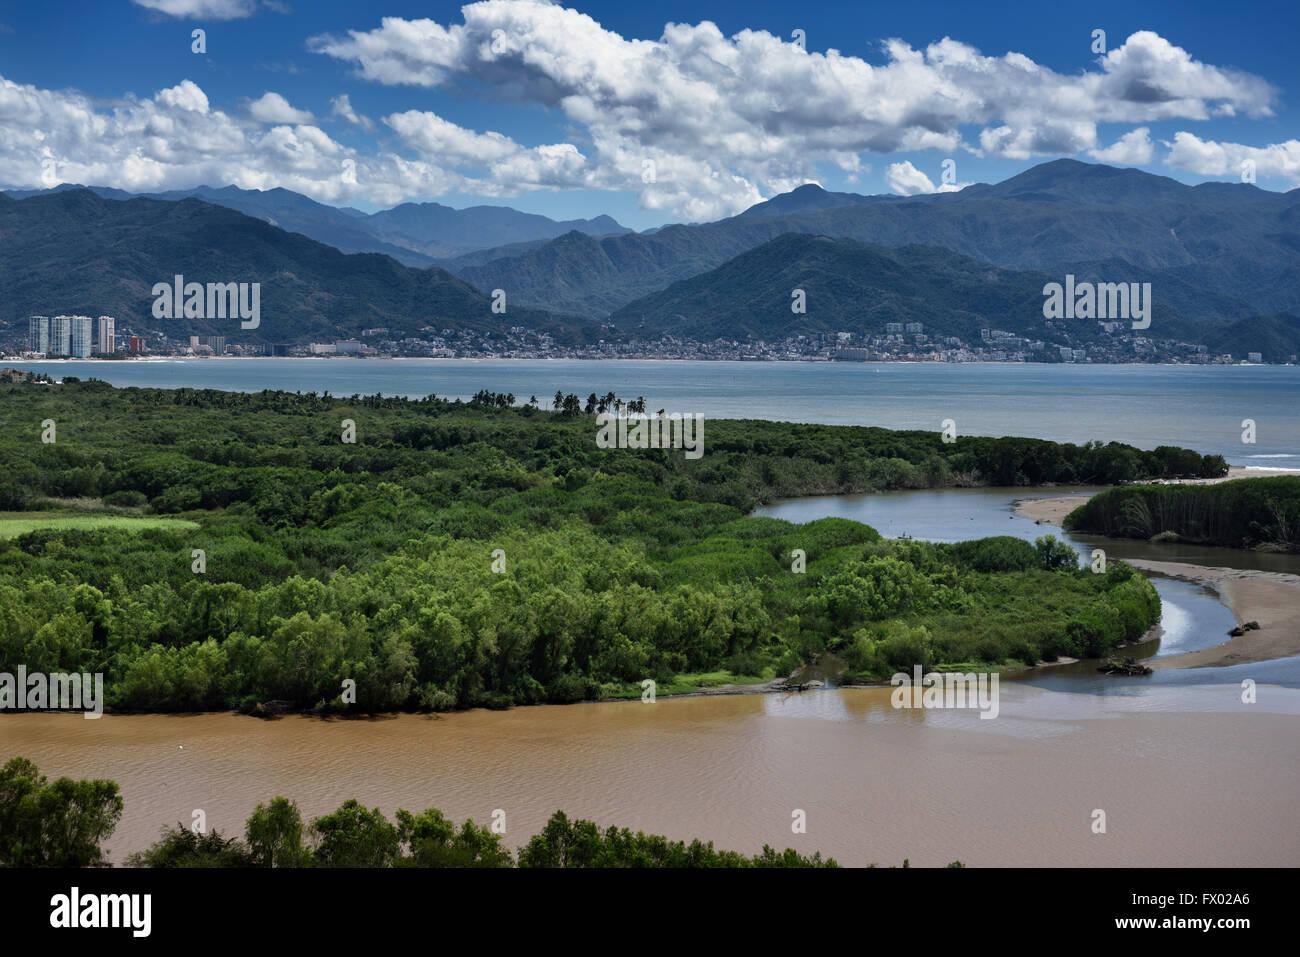 Puerto Vallarta between Banderas Bay and muddy Ameca river and Sierra Madre Mountains Mexico - Stock Image